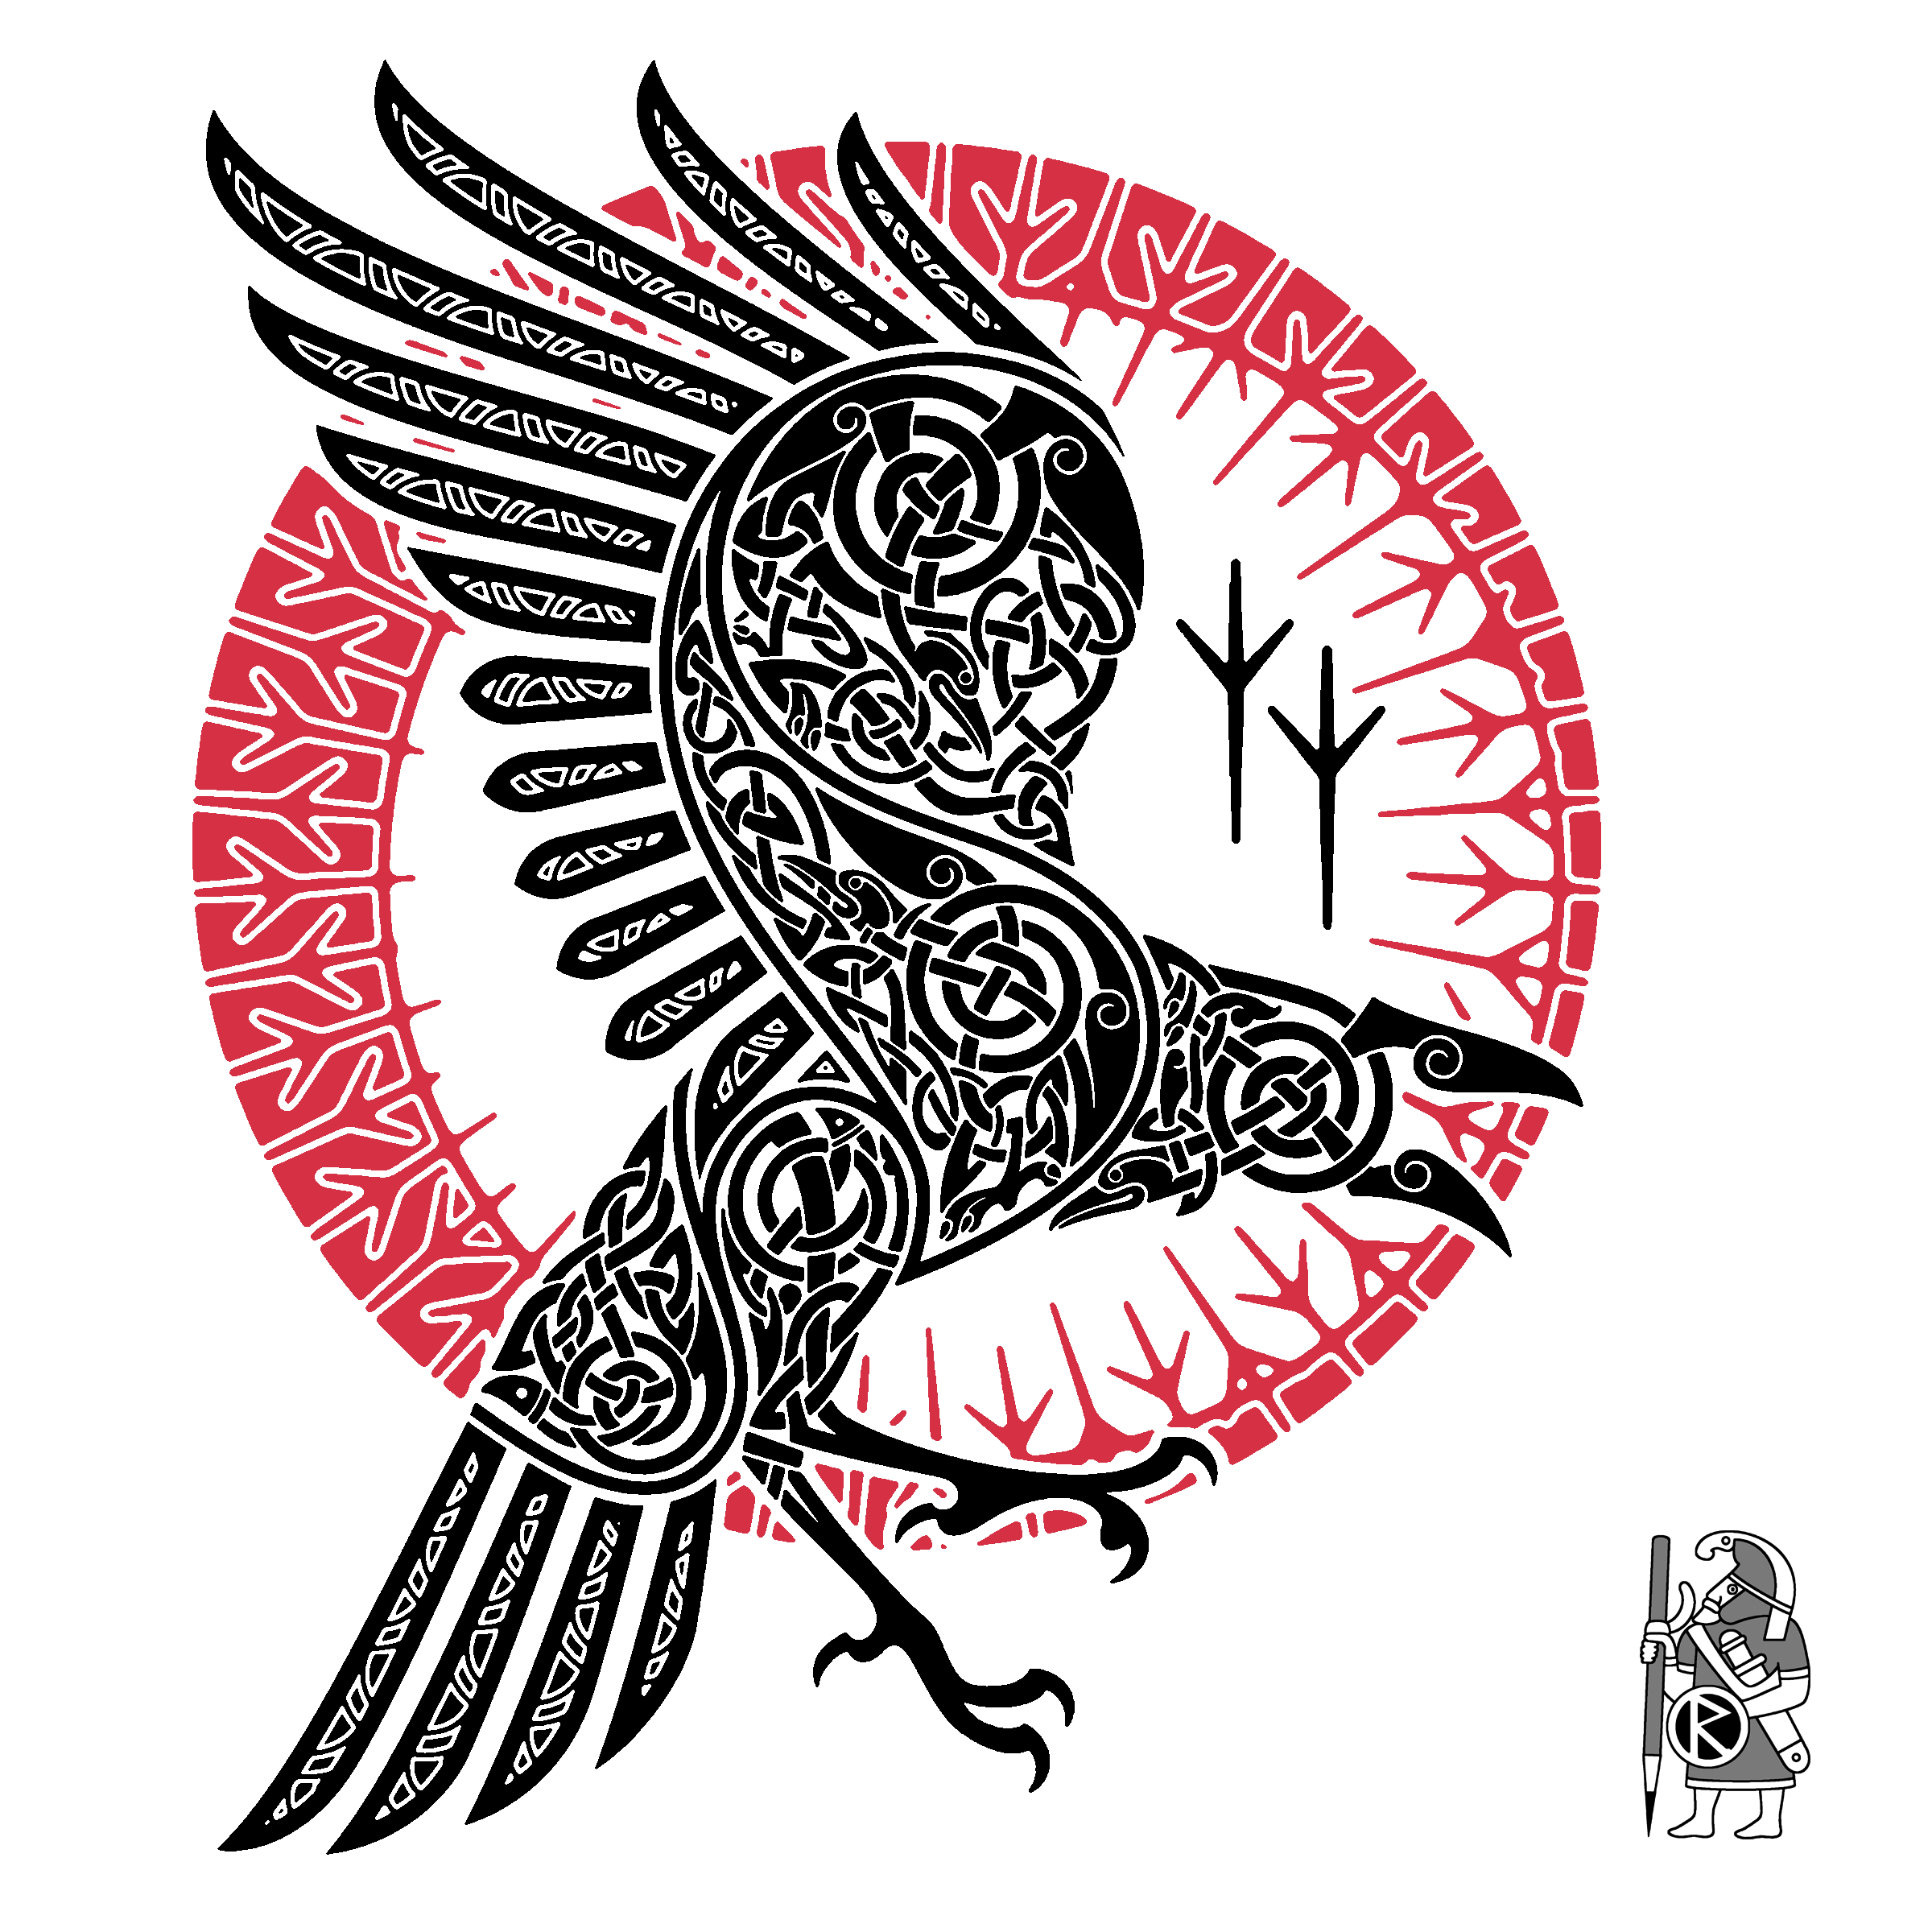 Ragnar 39 s raven by raidho tattoo pinterest ravens for Ragnar head tattoo stencil